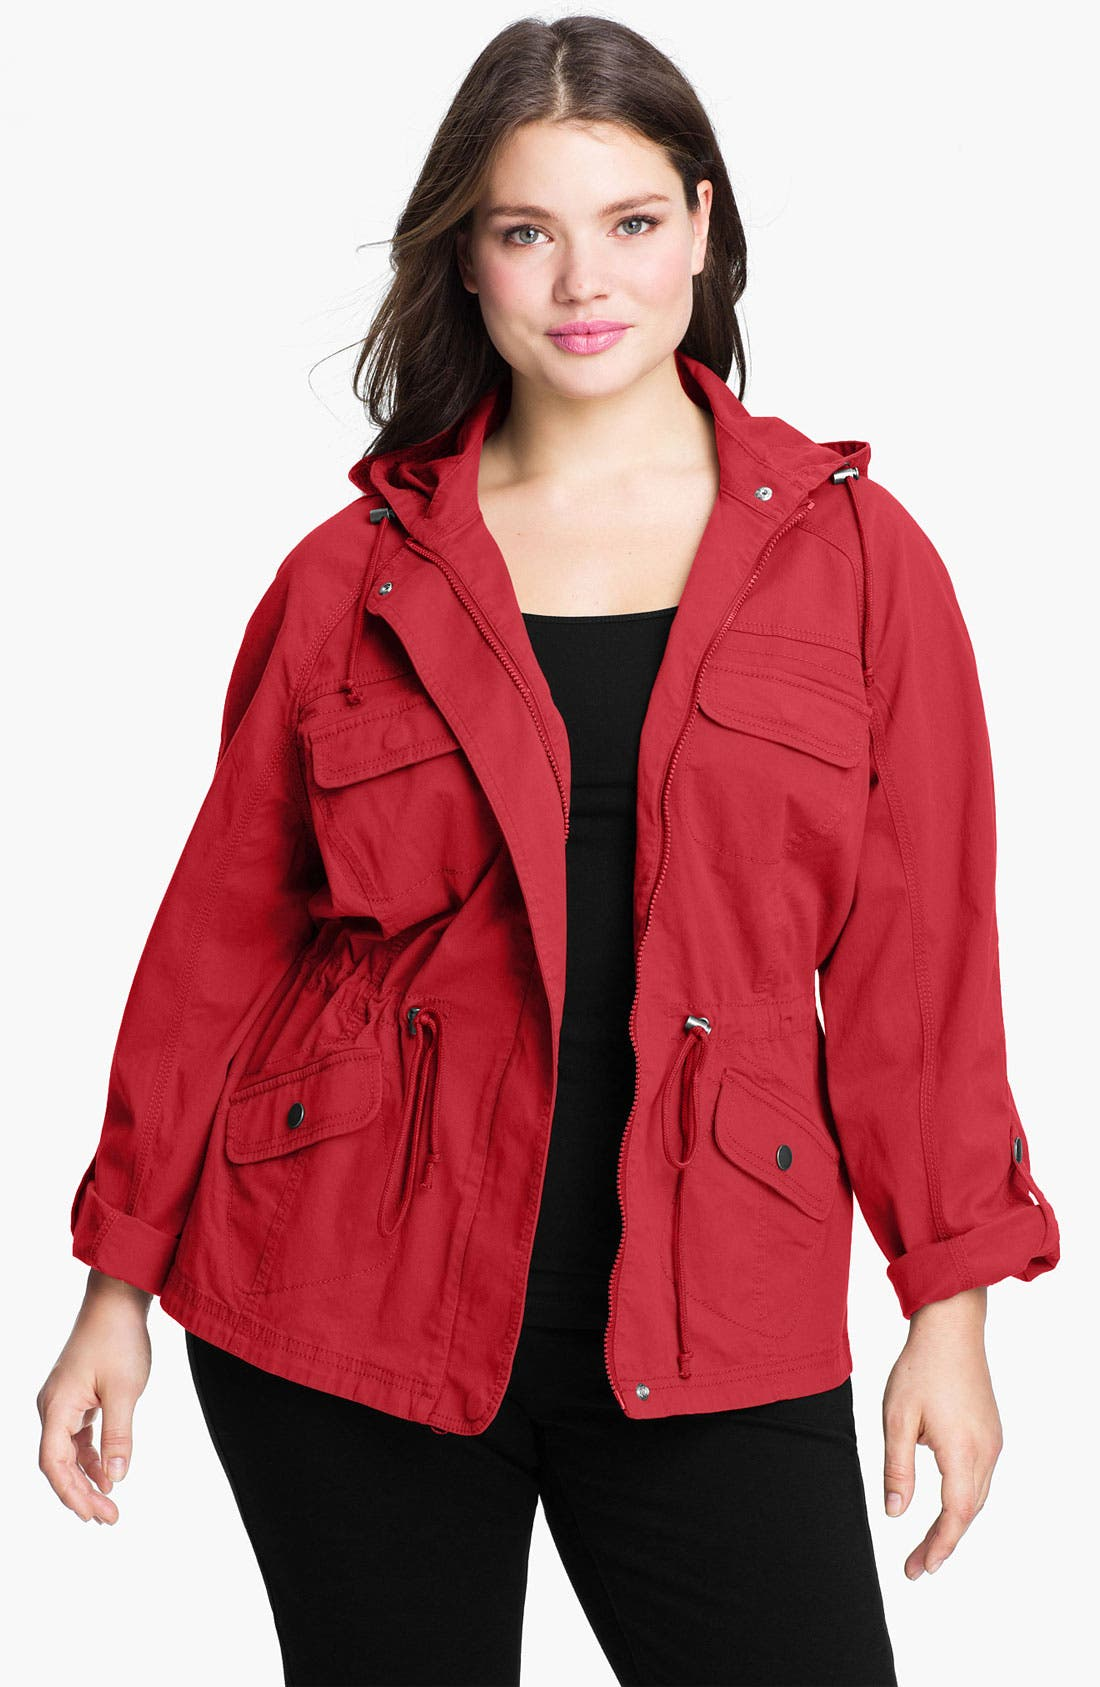 Alternate Image 1 Selected - Sejour 'Megan' Roll Sleeve Twill Jacket (Plus Size)